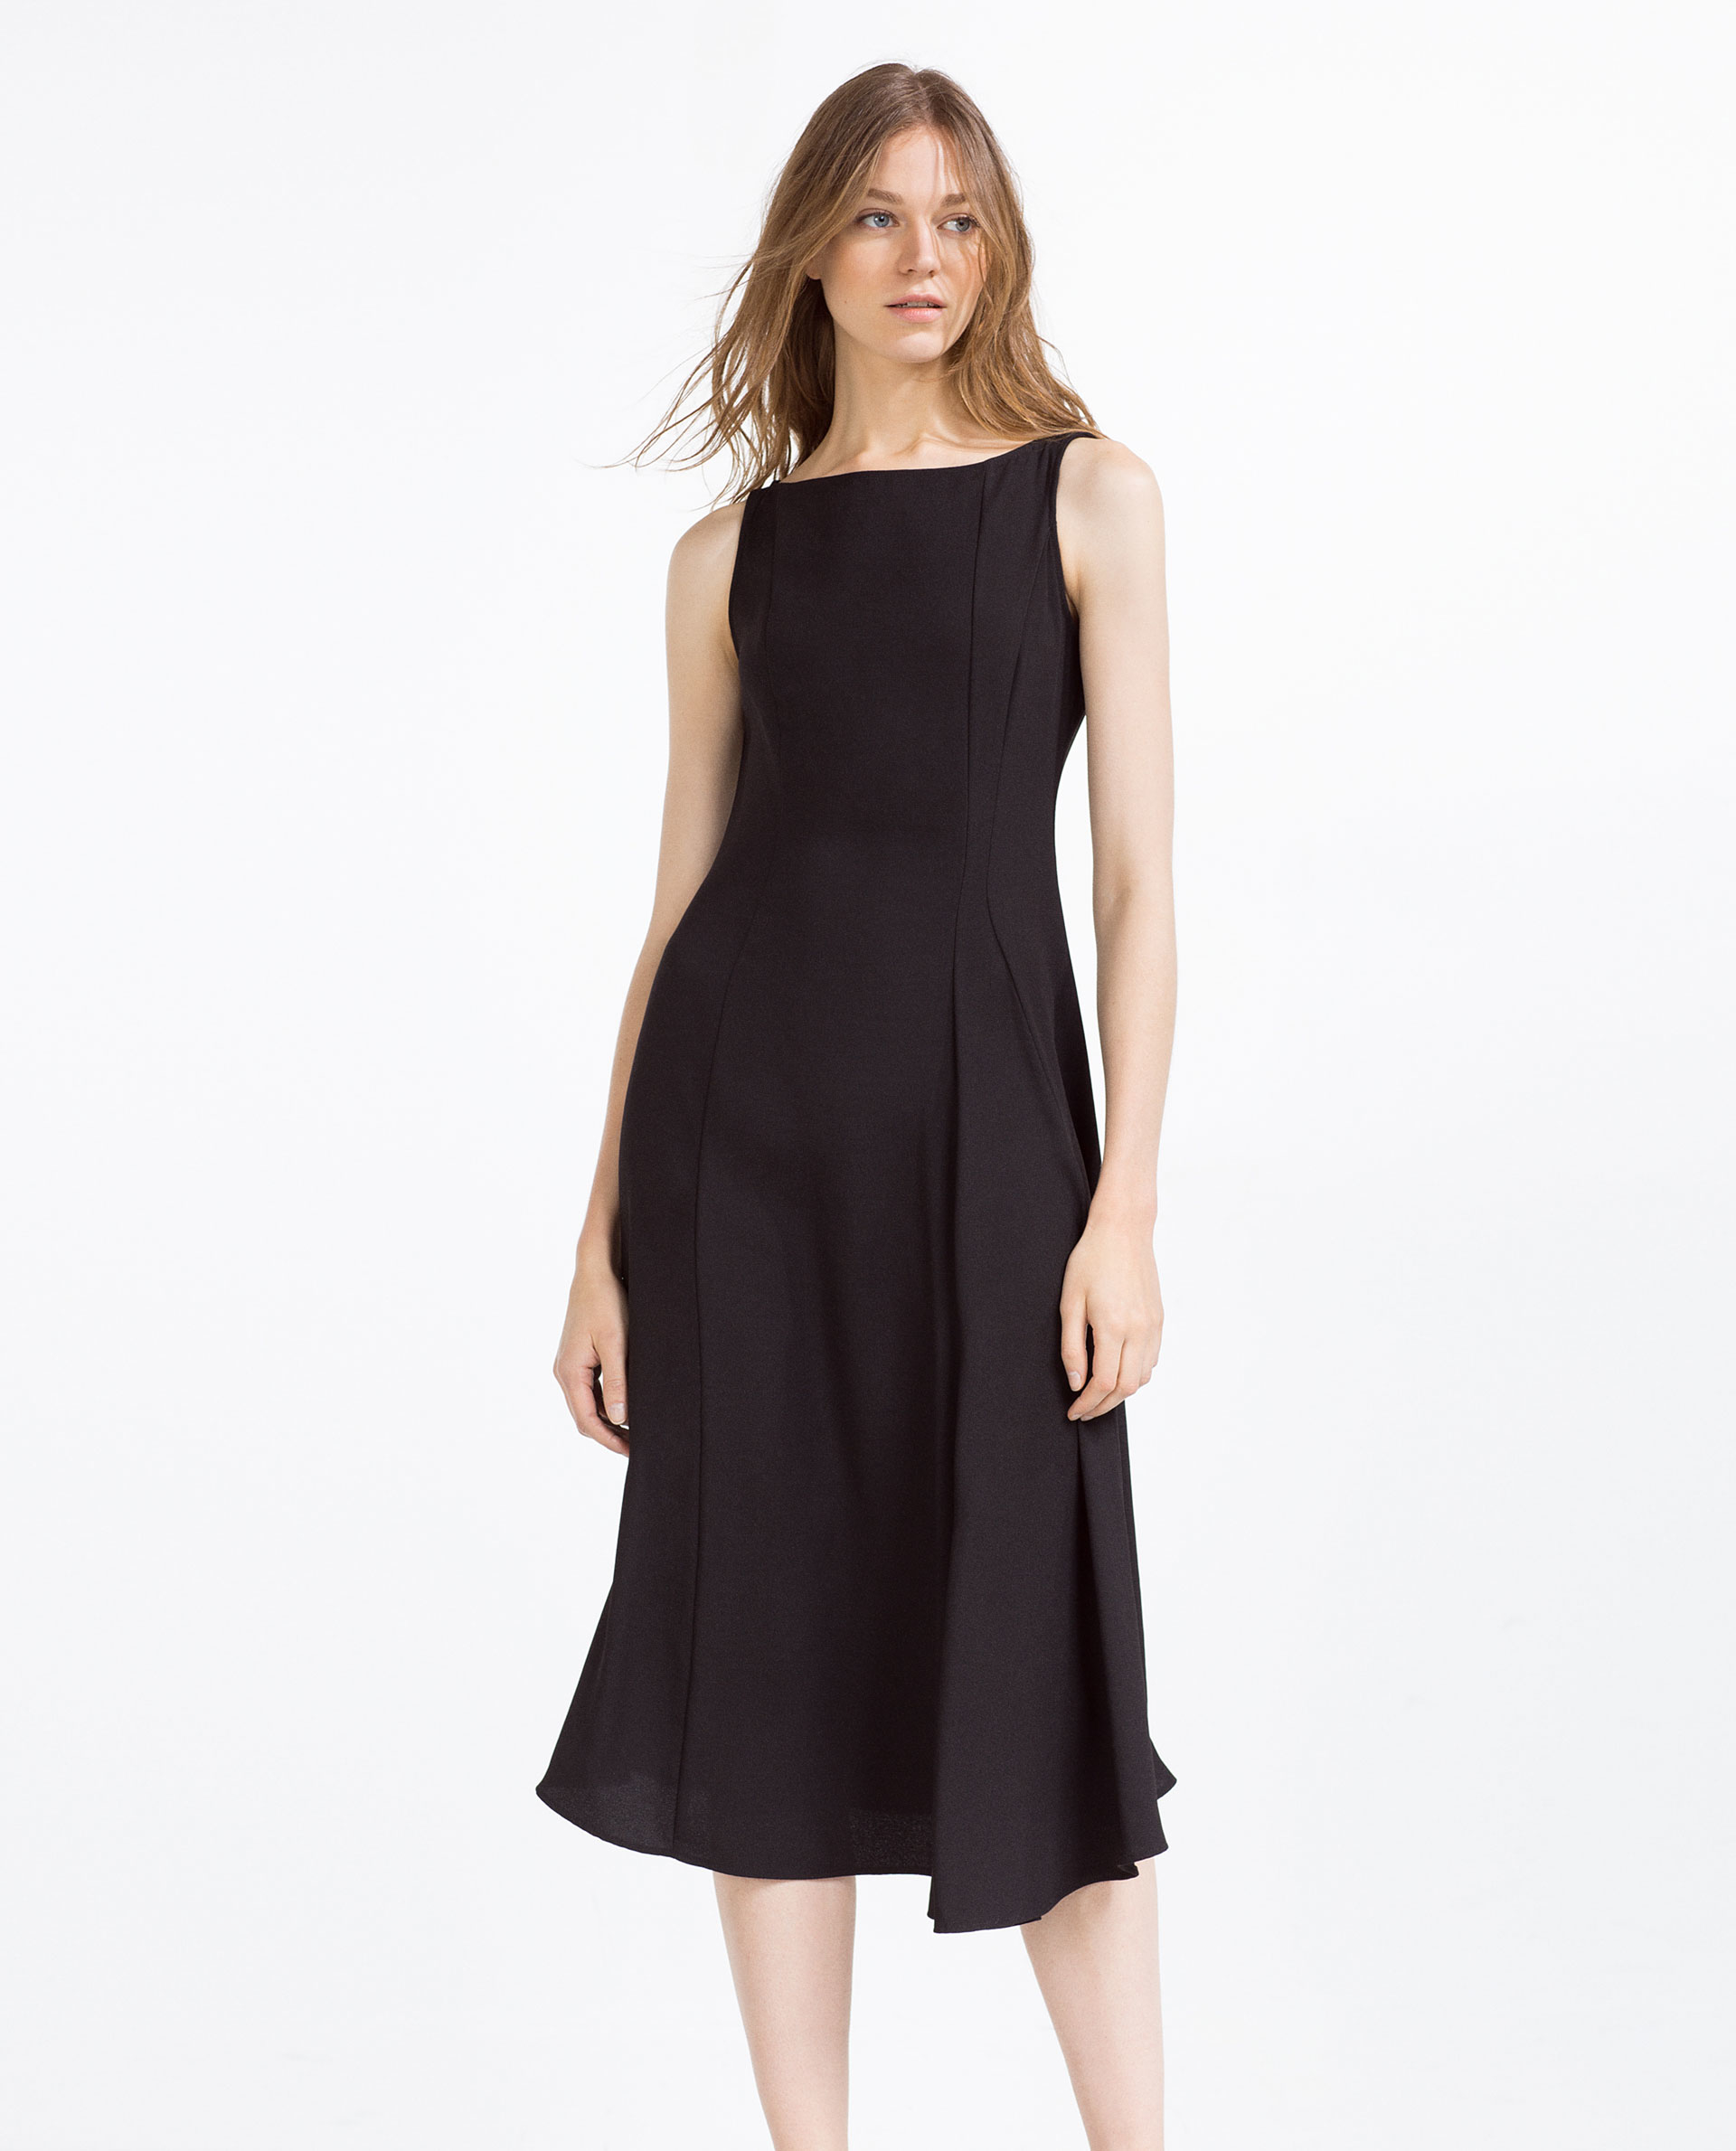 Black Mid Length Dresses